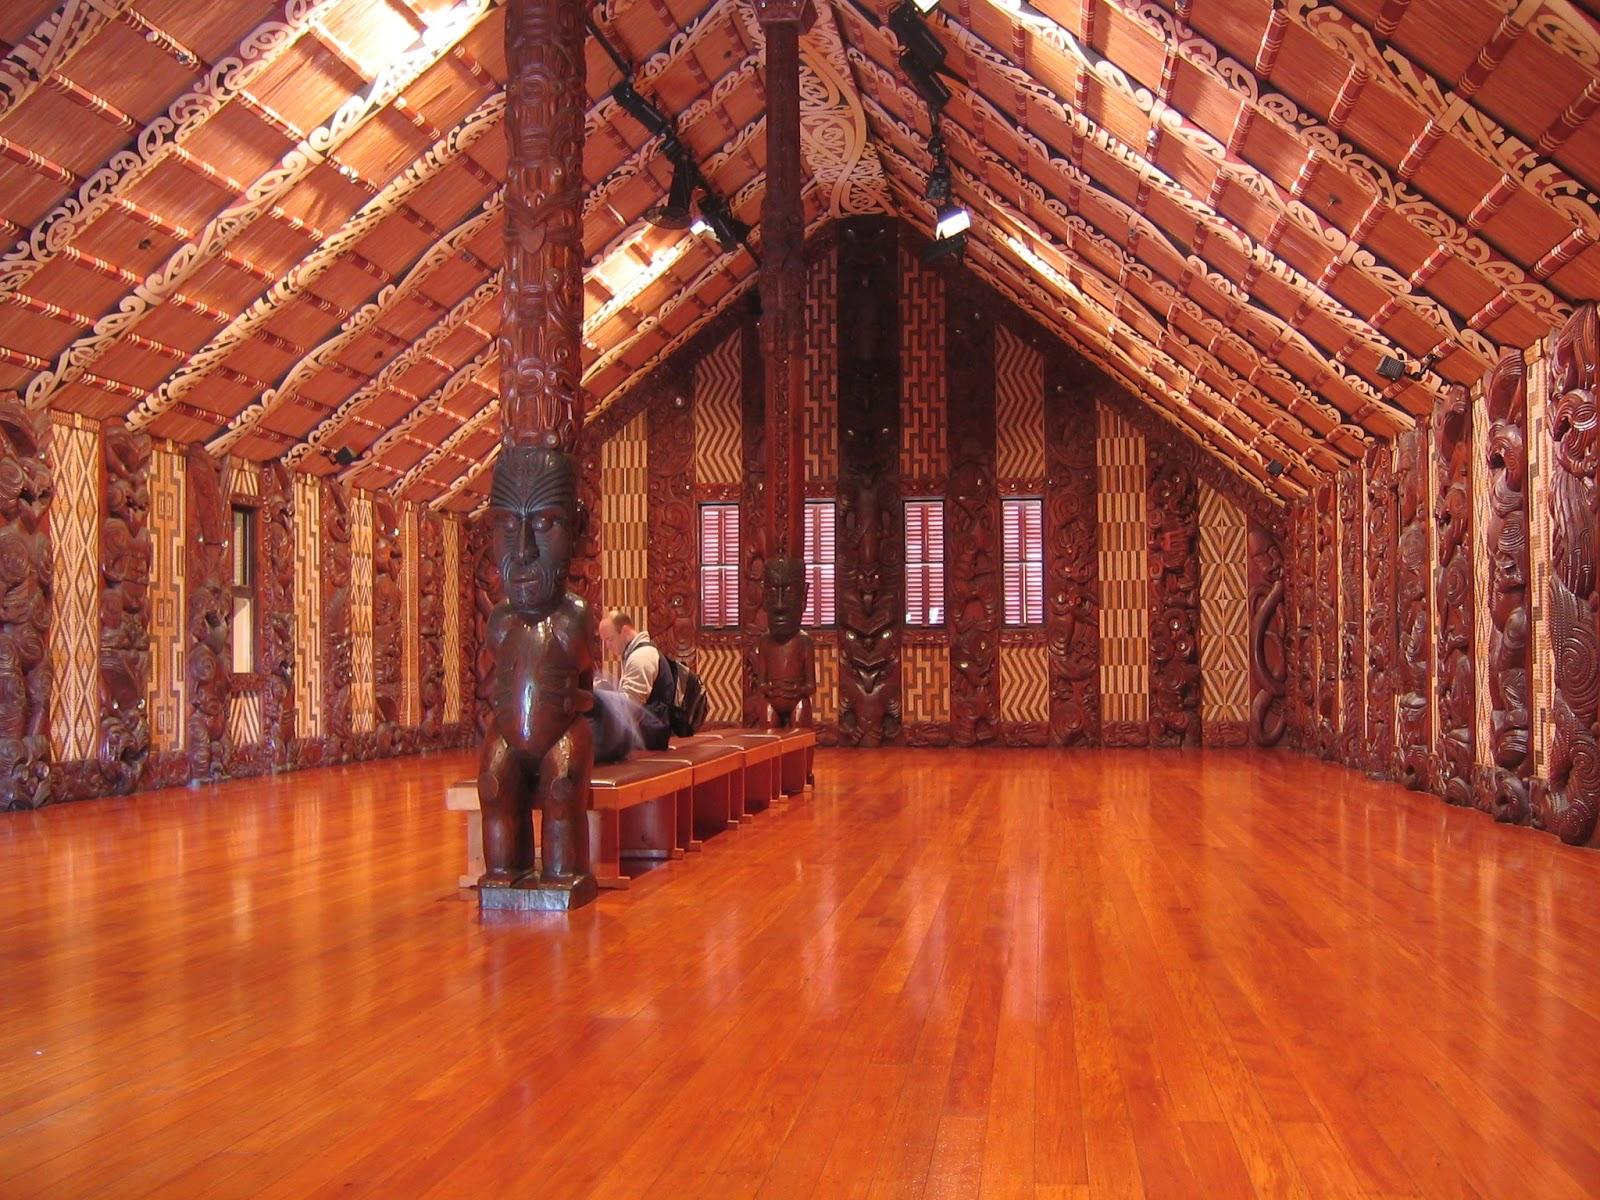 Katie 39 S Global Adventure Day 3 Lake Rotorua And Life On